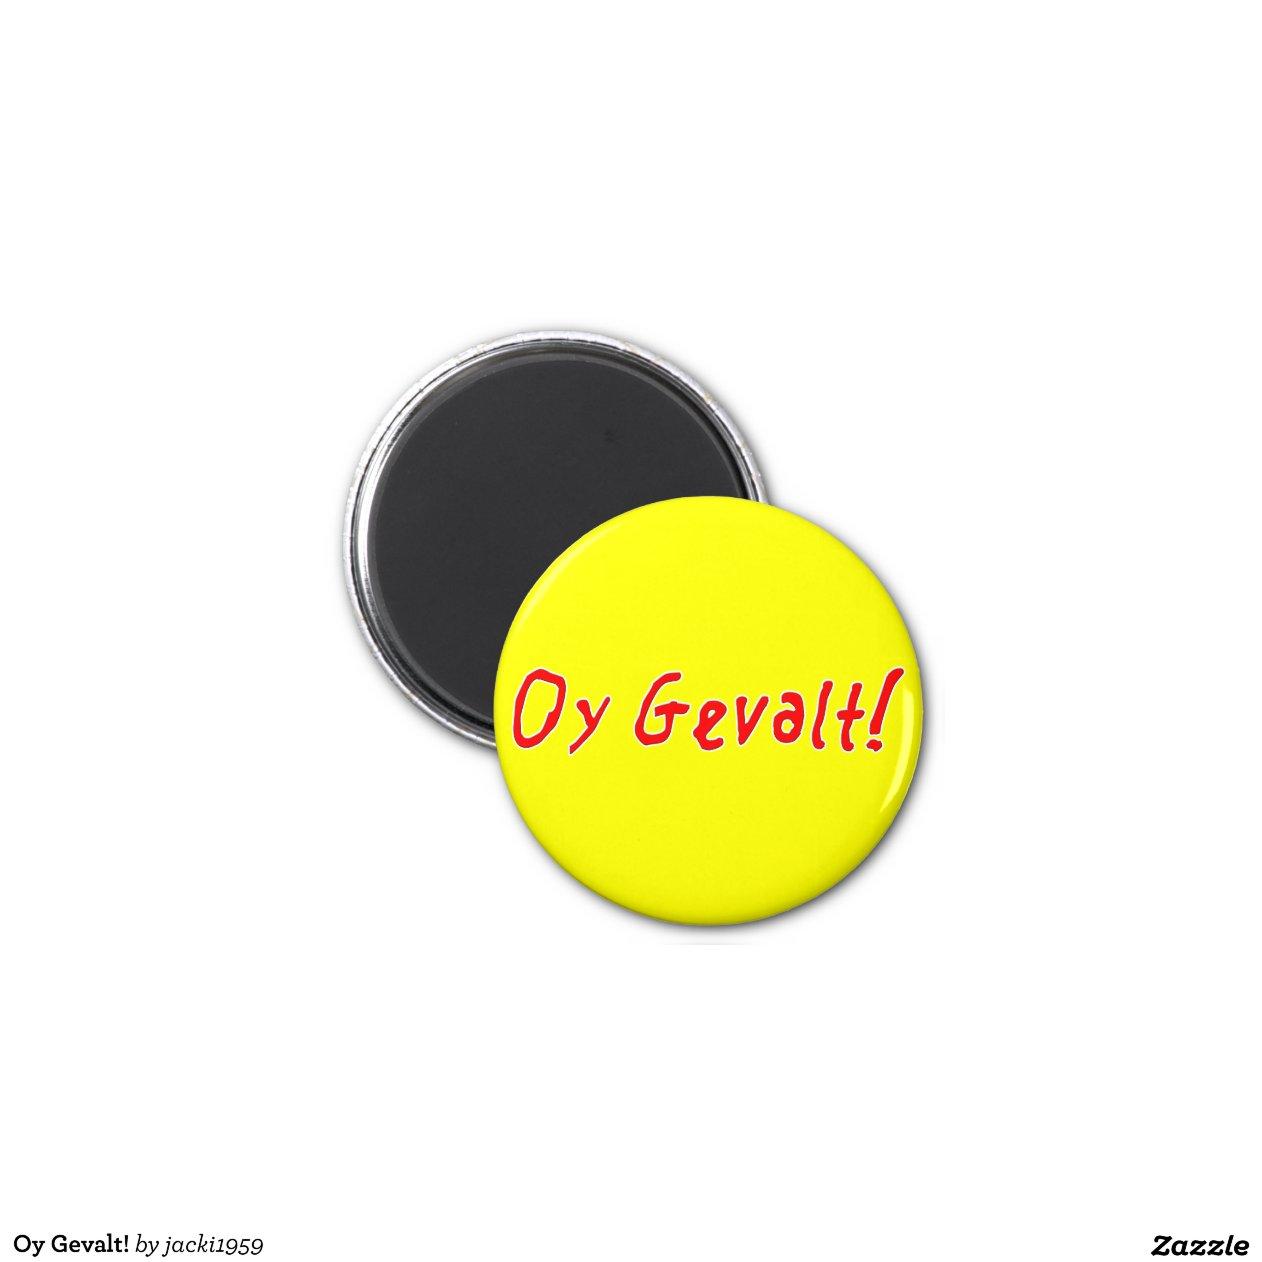 Oy Vey Gevalt